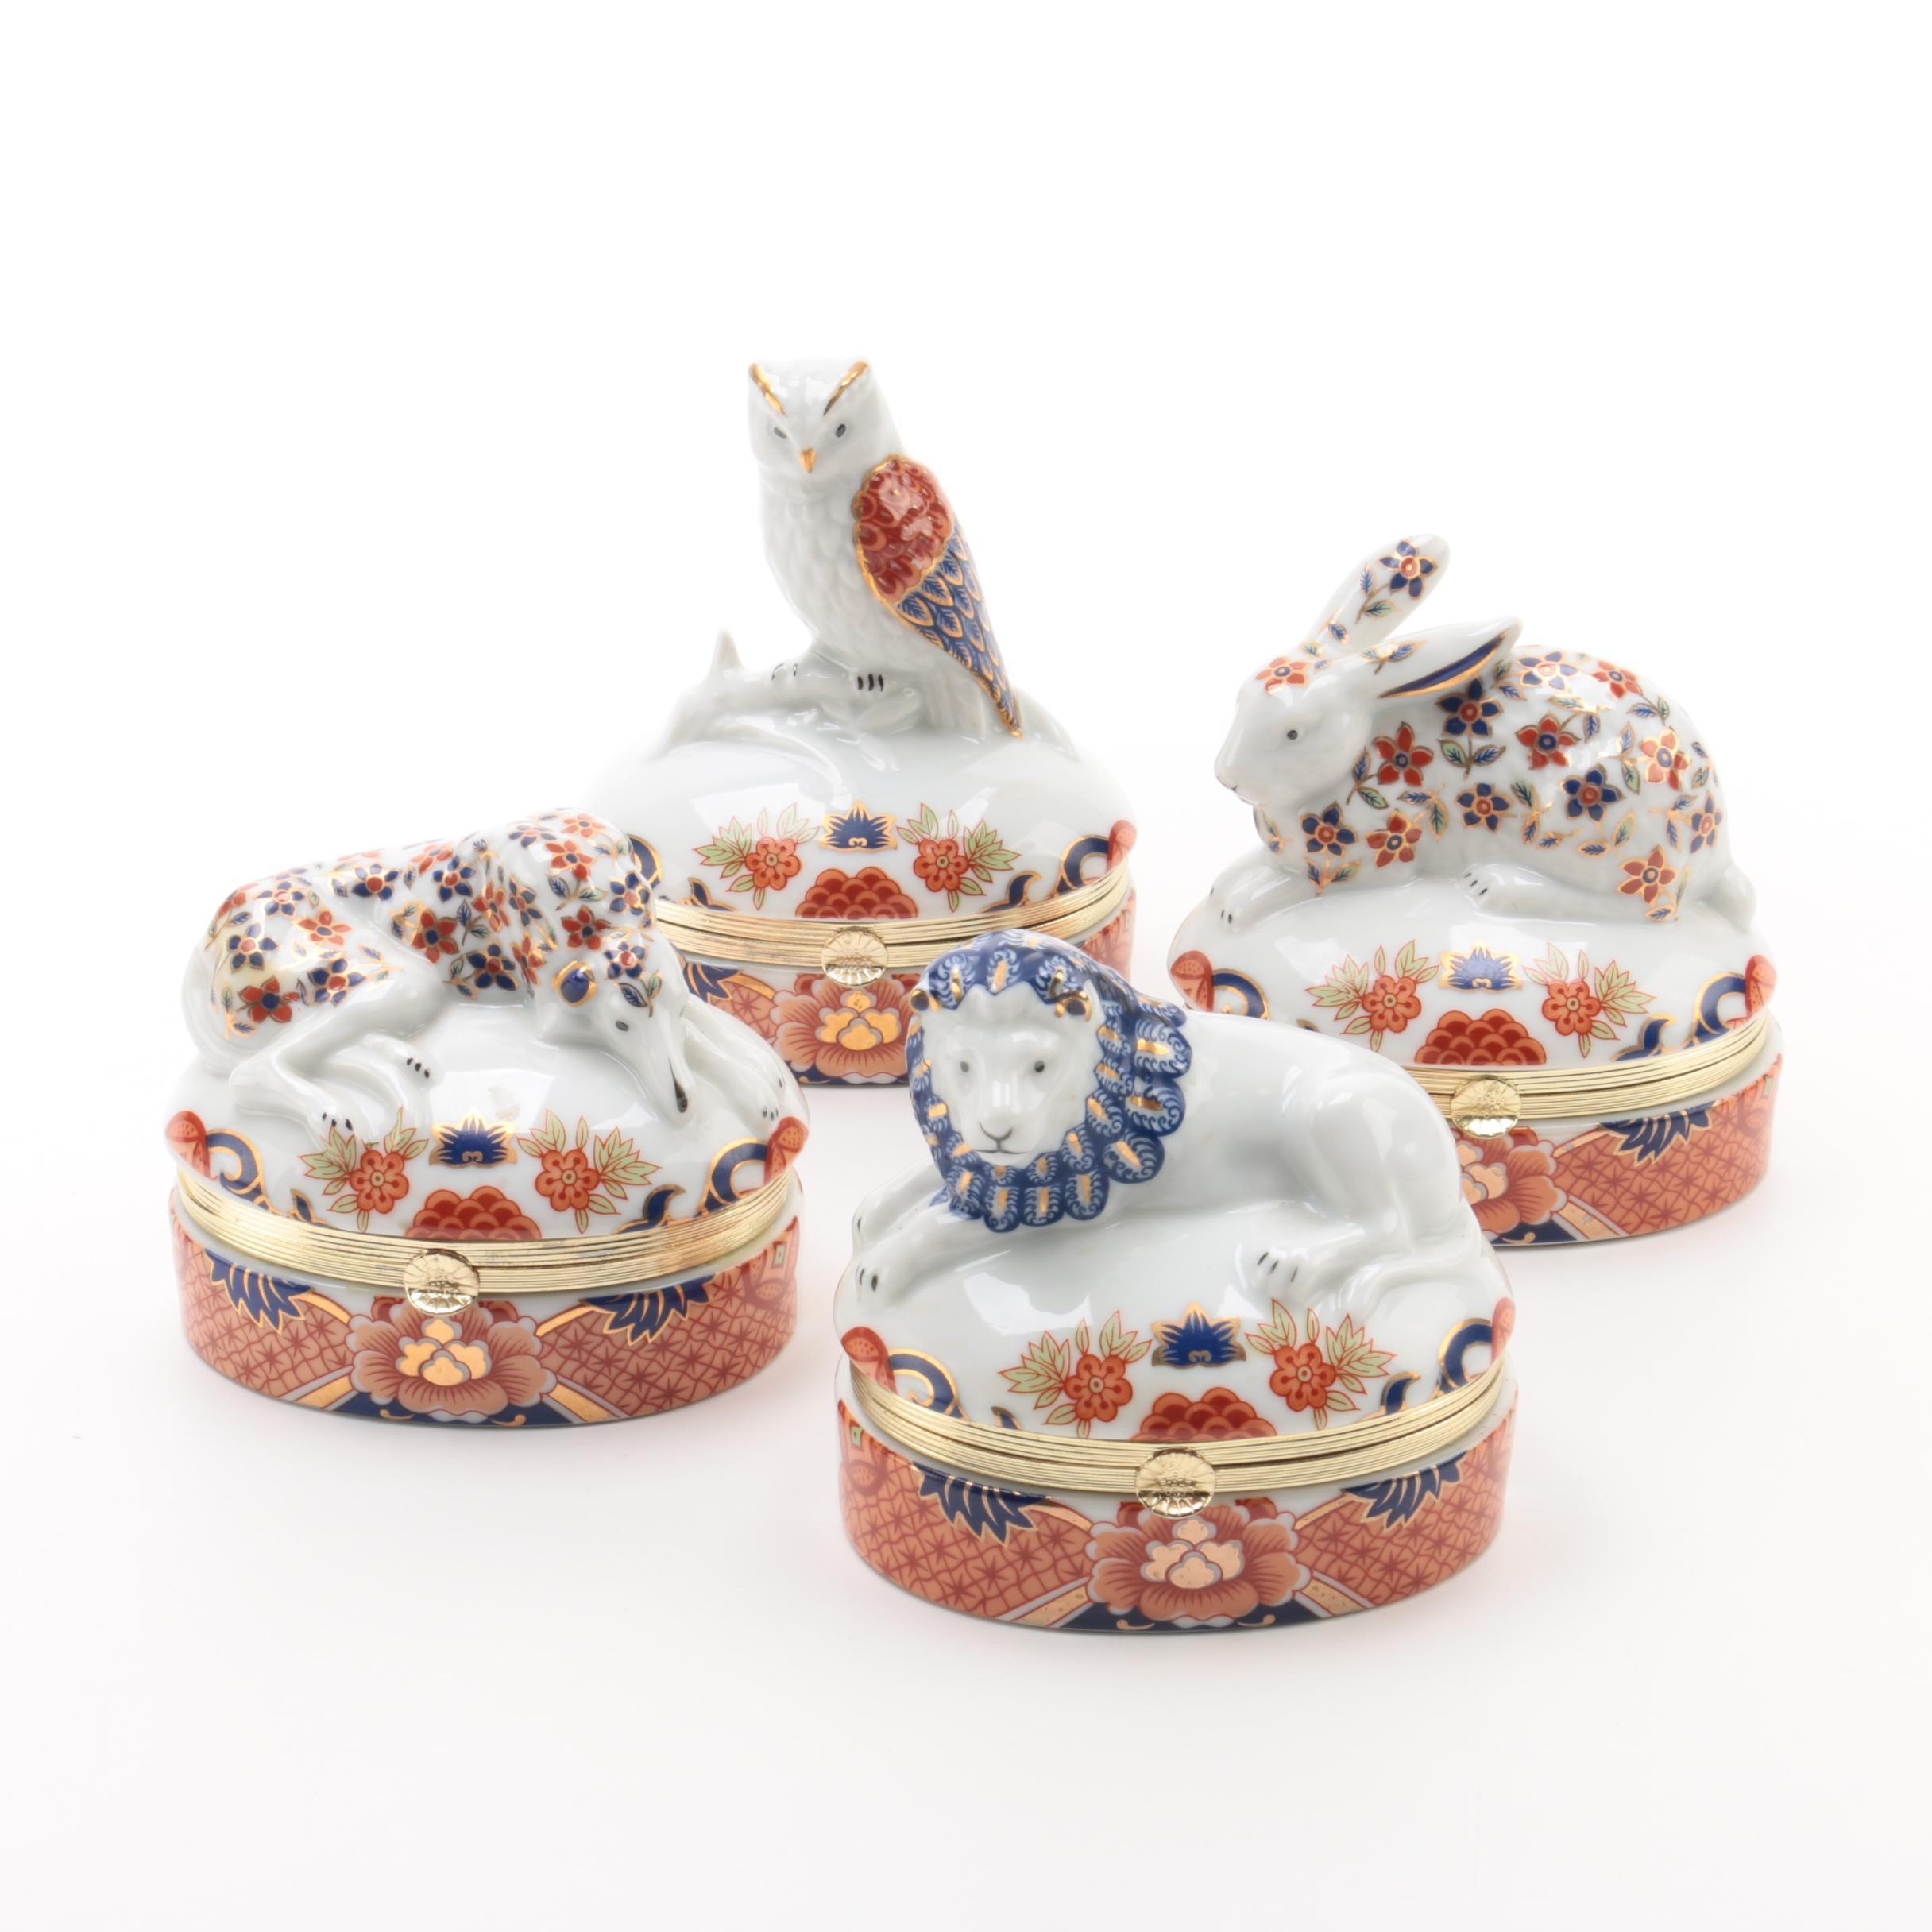 Andrea by Sadek Animal Themed Porcelain Trinket Boxes